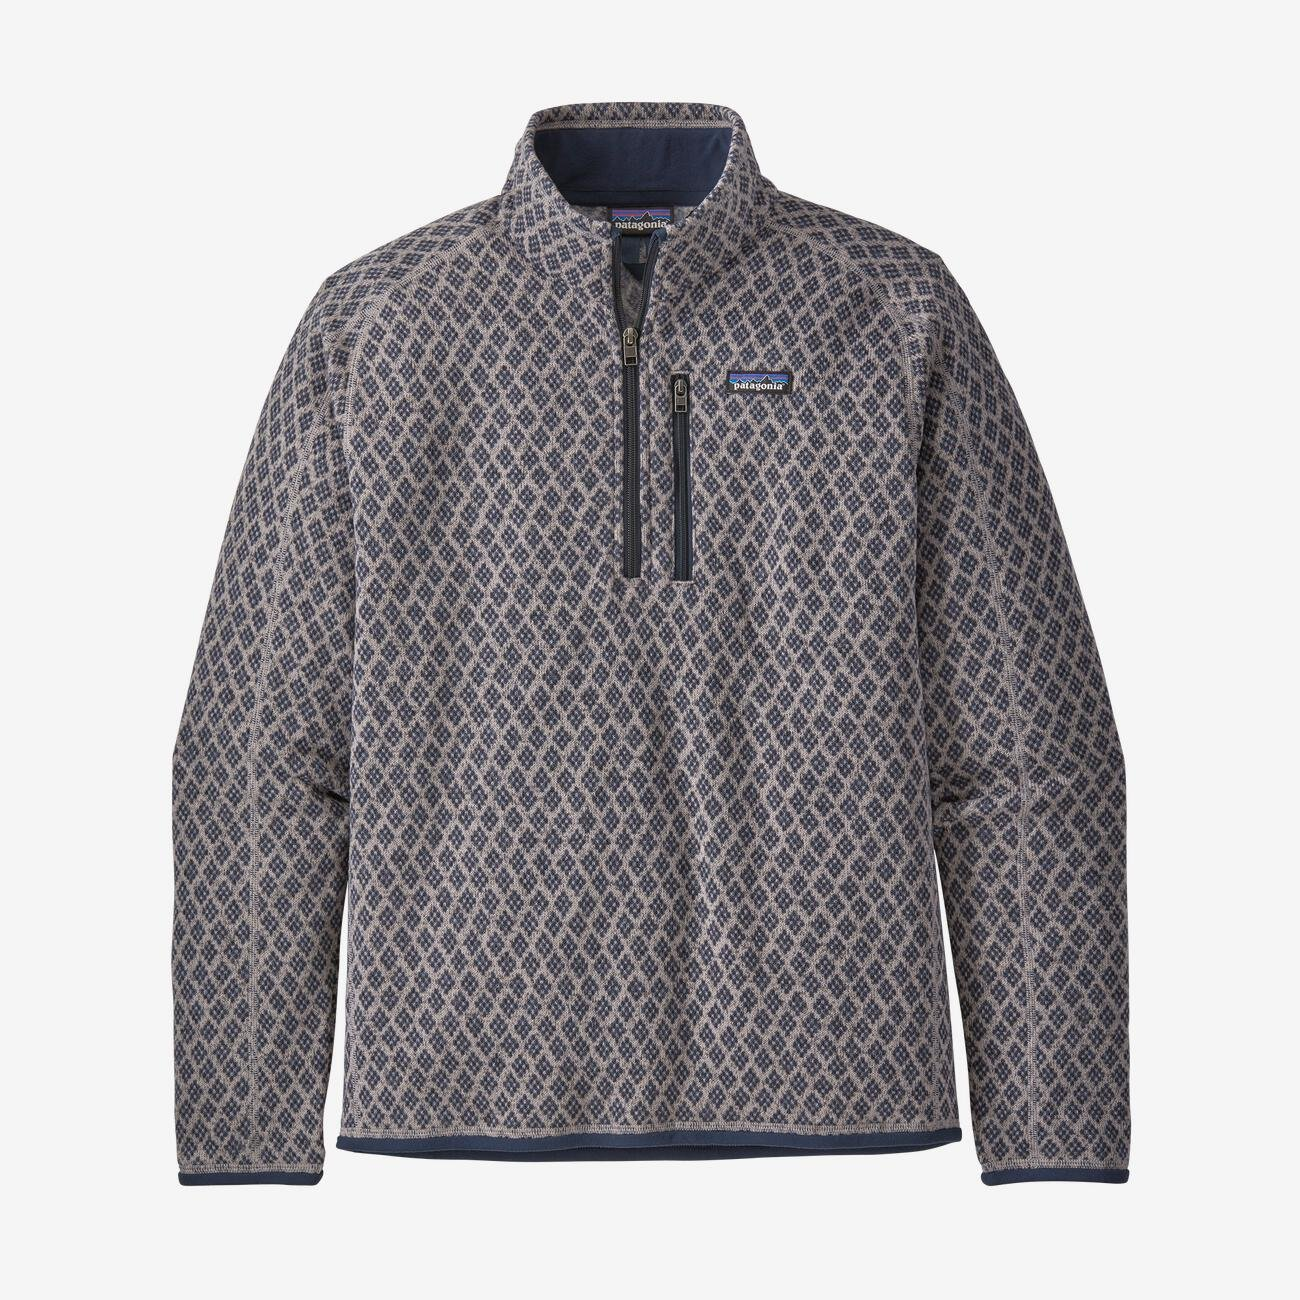 M's Patagonia Better Sweater 1/4 Zip - Imprint